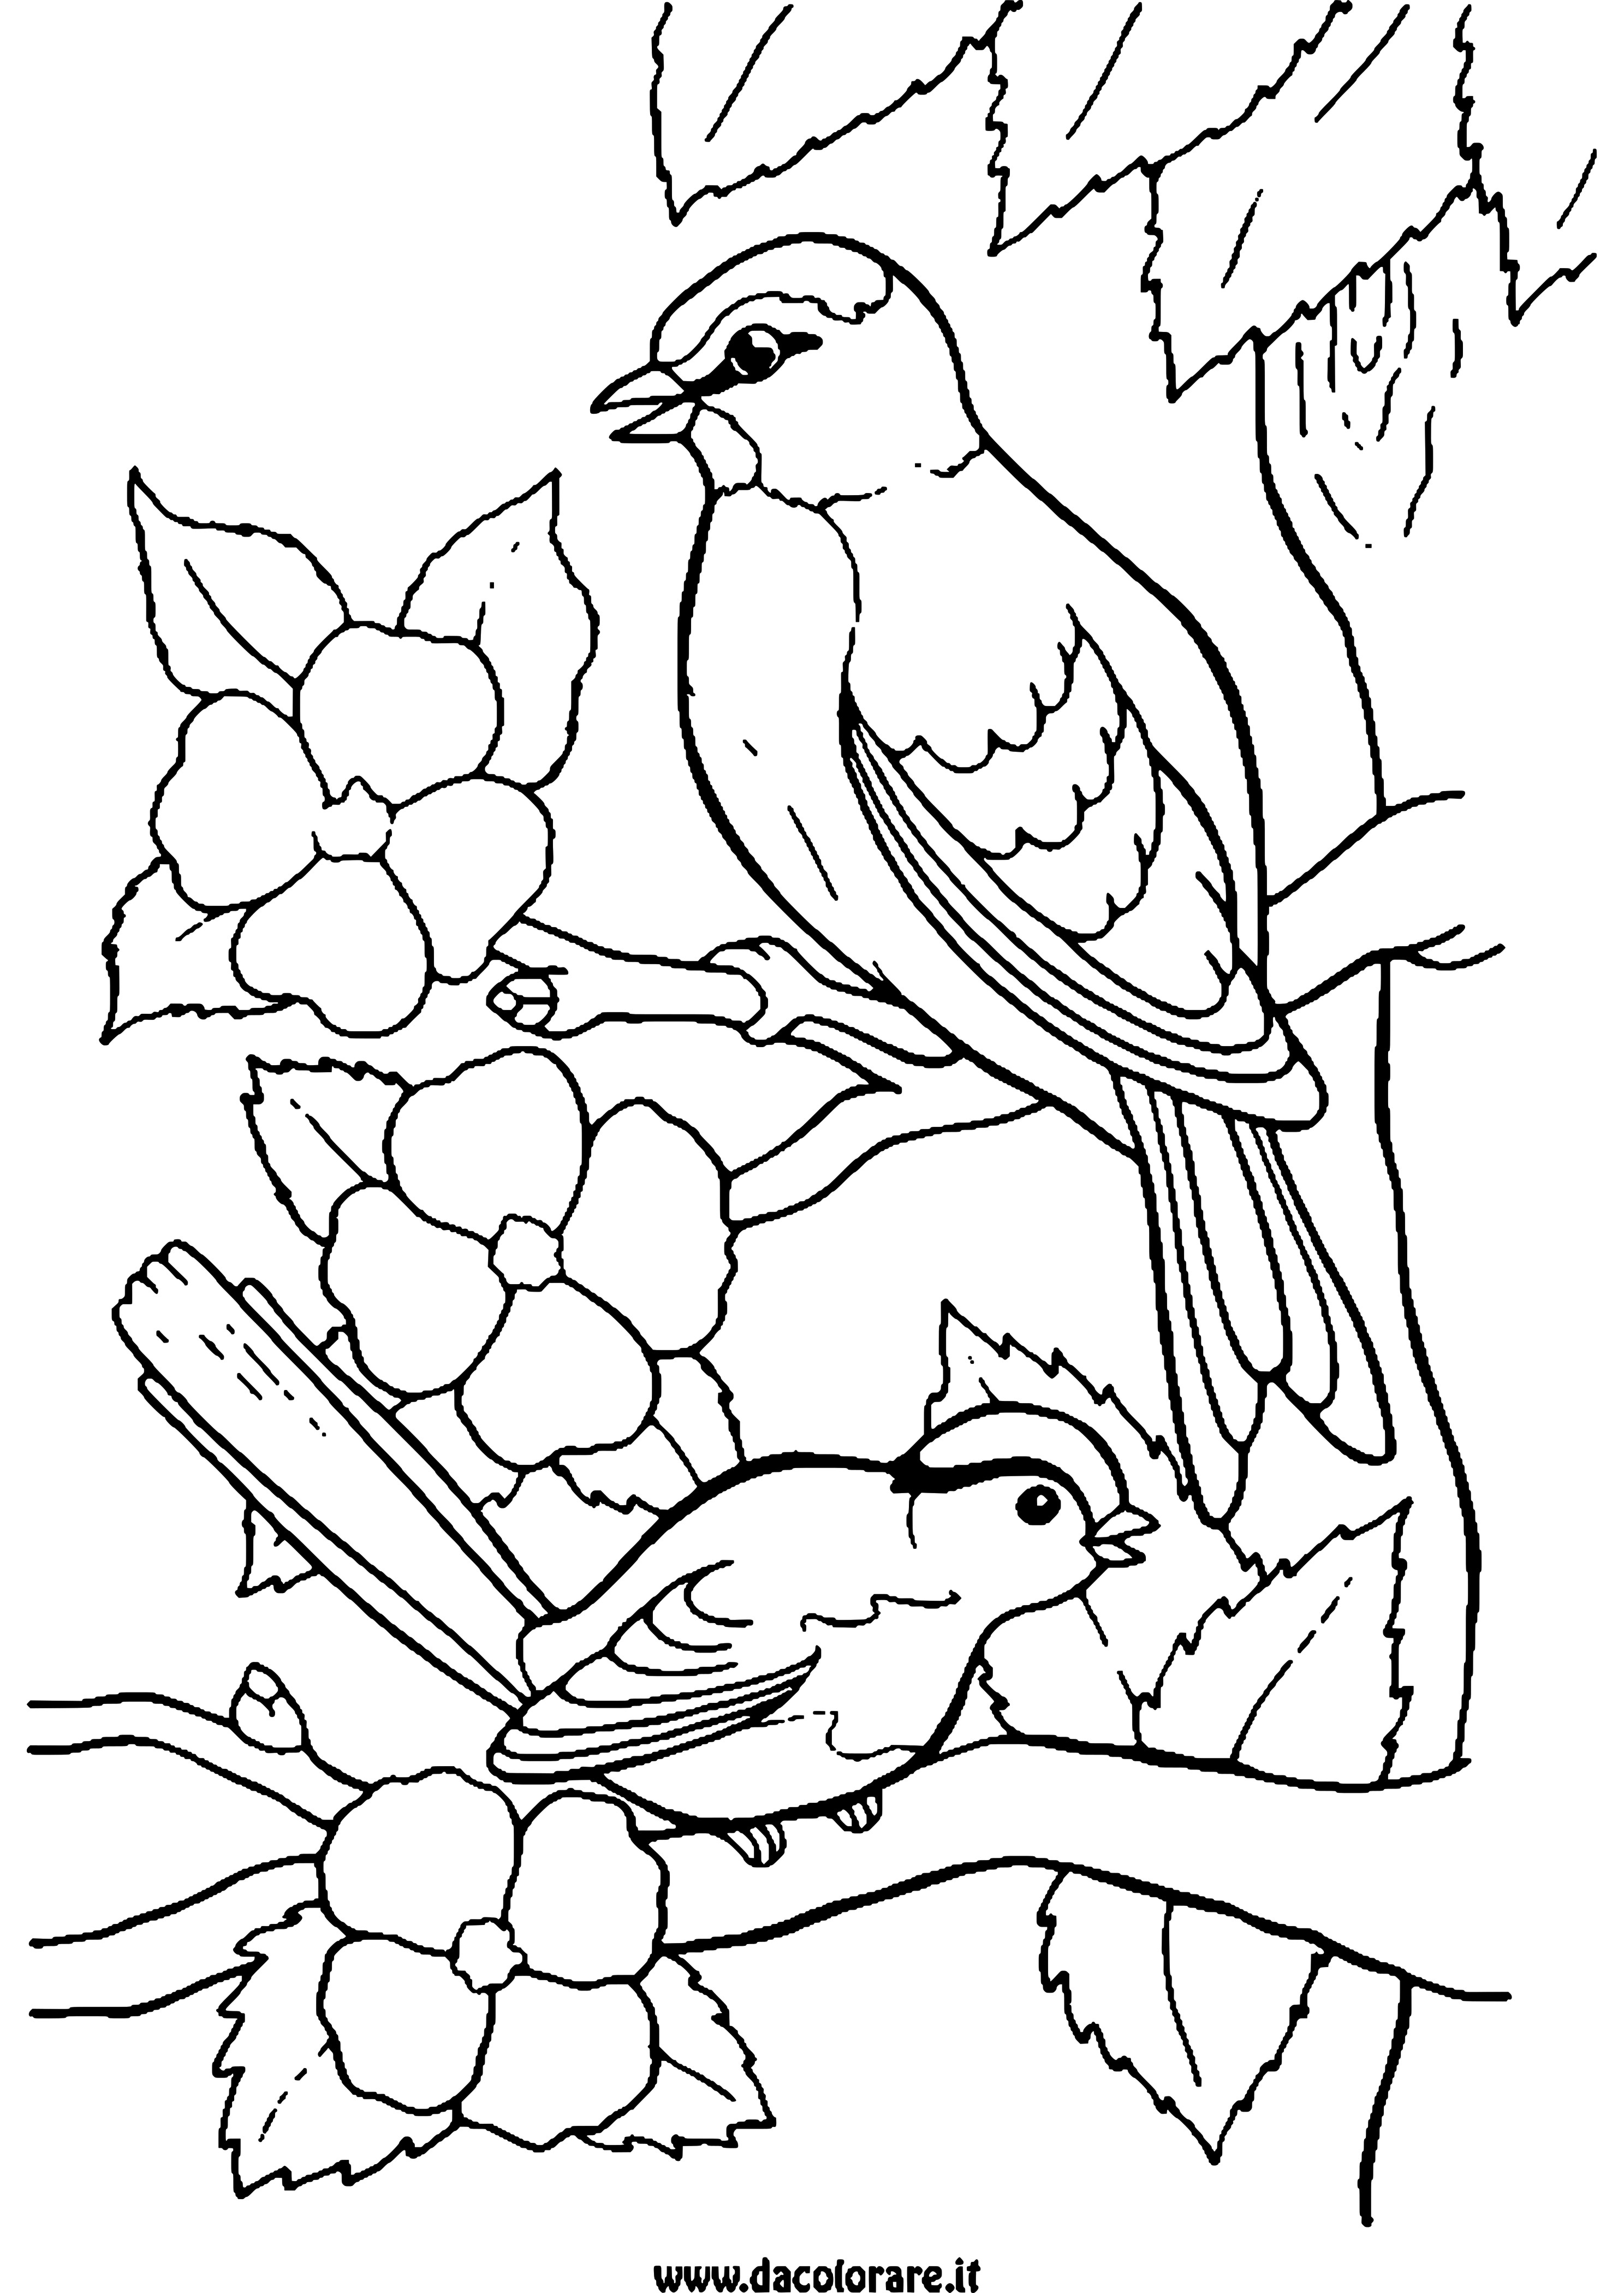 die besten ausmalbilder vögel im frühling  beste